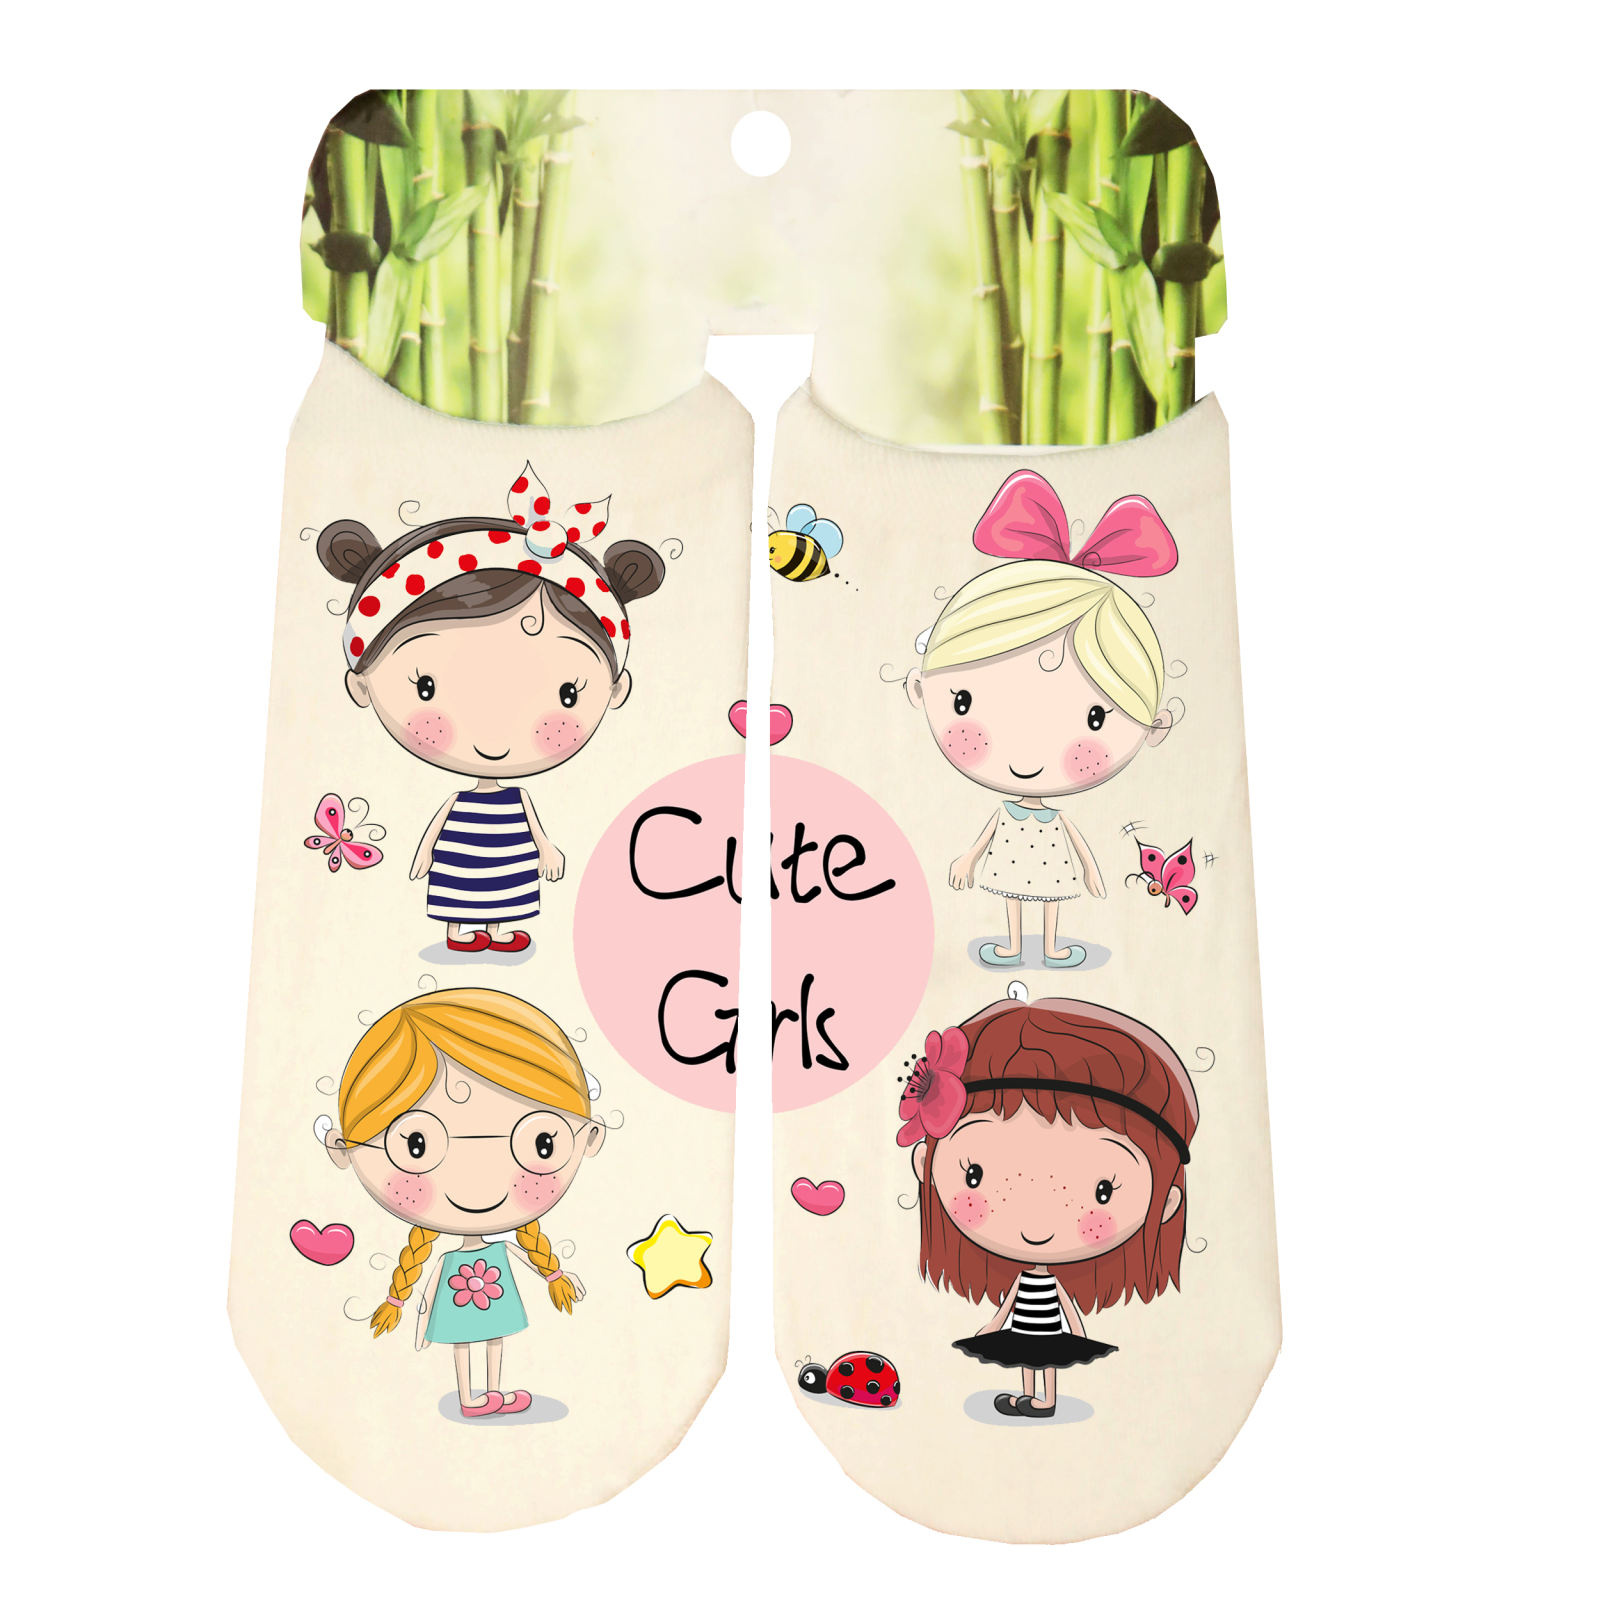 جوراب دخترانه طرح دختر کد SCb51 -  - 3